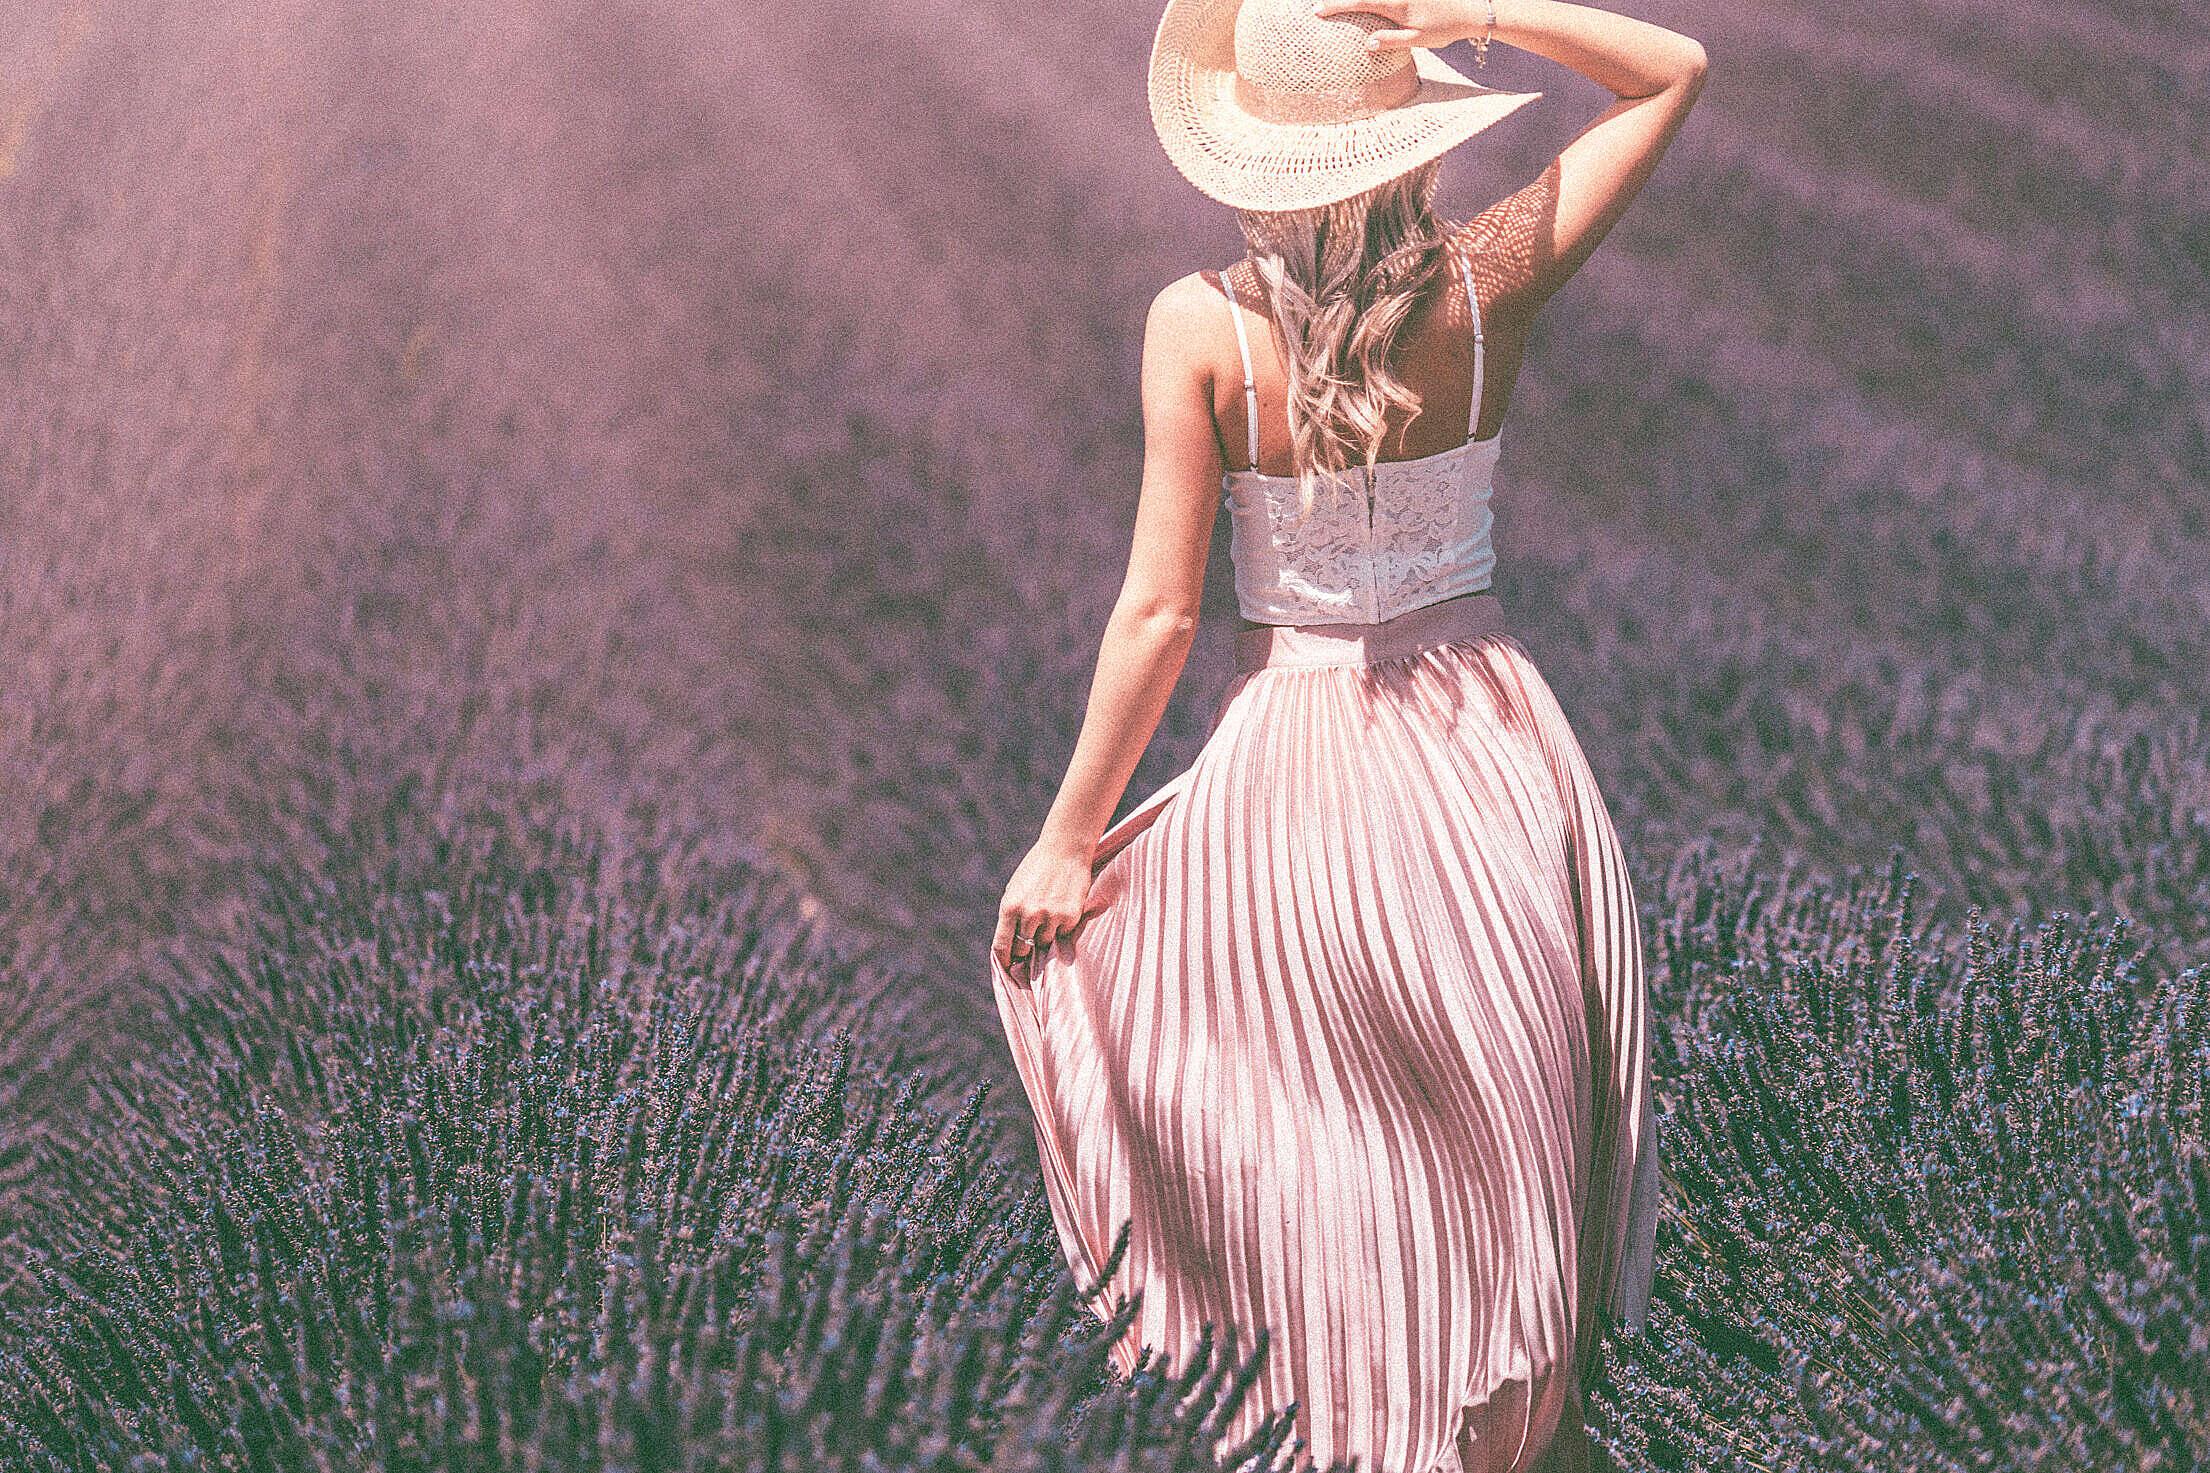 Vintage Lavender Field Free Stock Photo